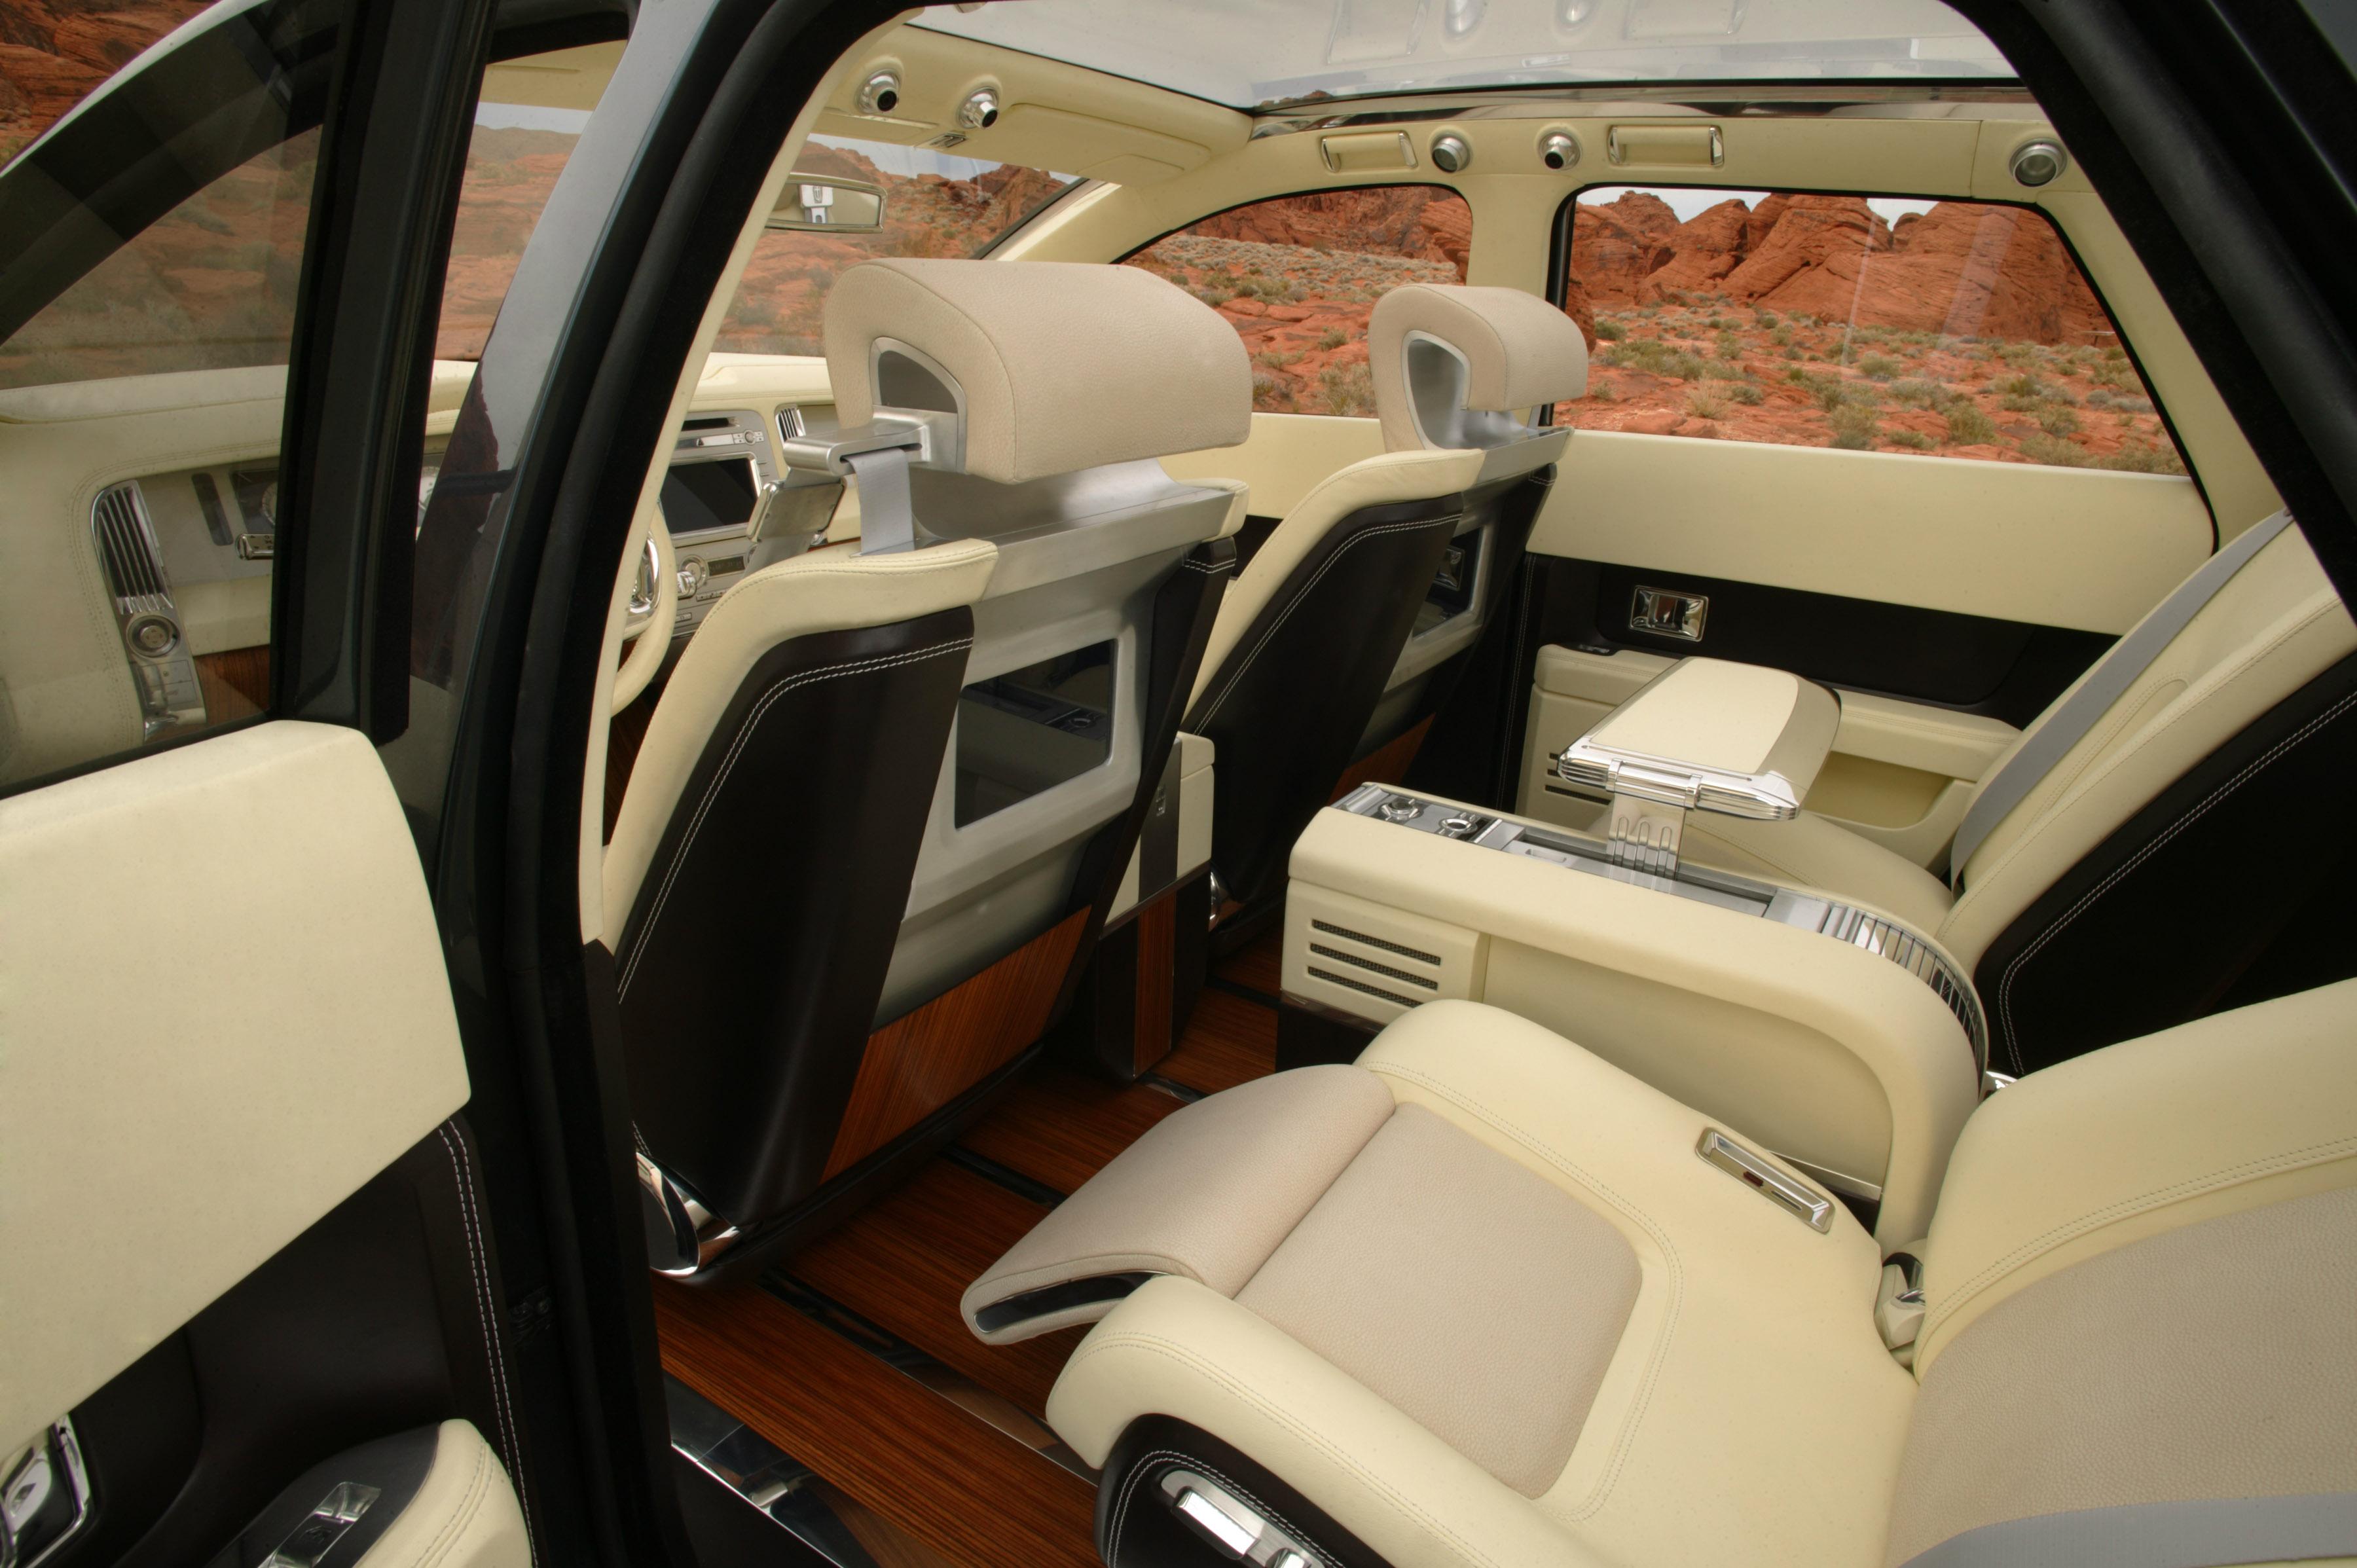 https://www.automobilesreview.com/gallery/lincoln-aviator-next-generation-concept/lincoln-aviator-concept-17.jpg